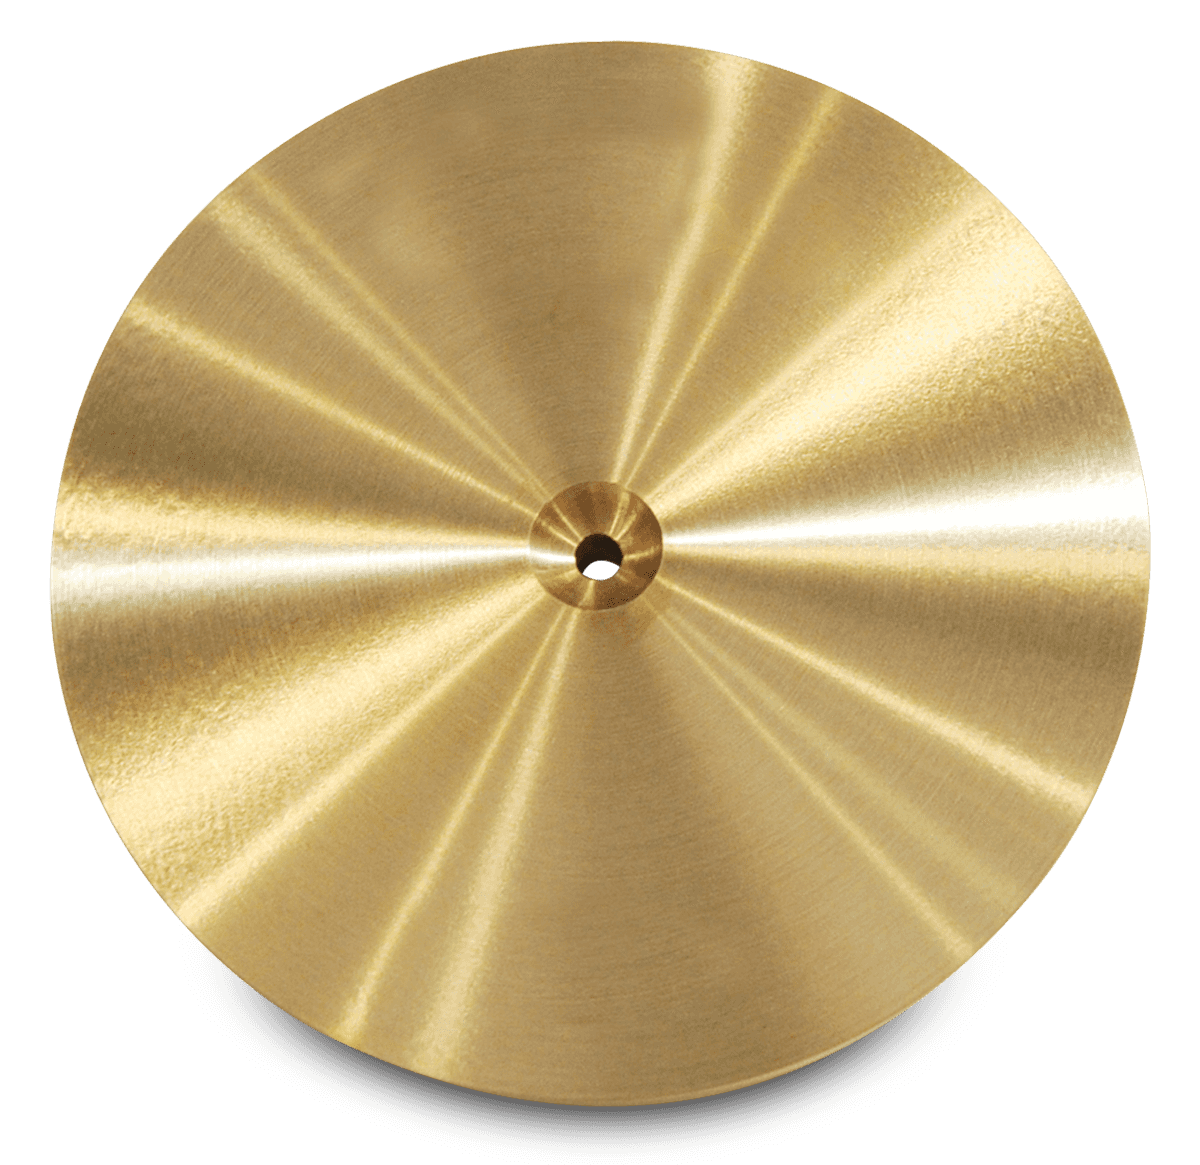 Zildjian CYMBALES D'ORCHESTRE P0622E